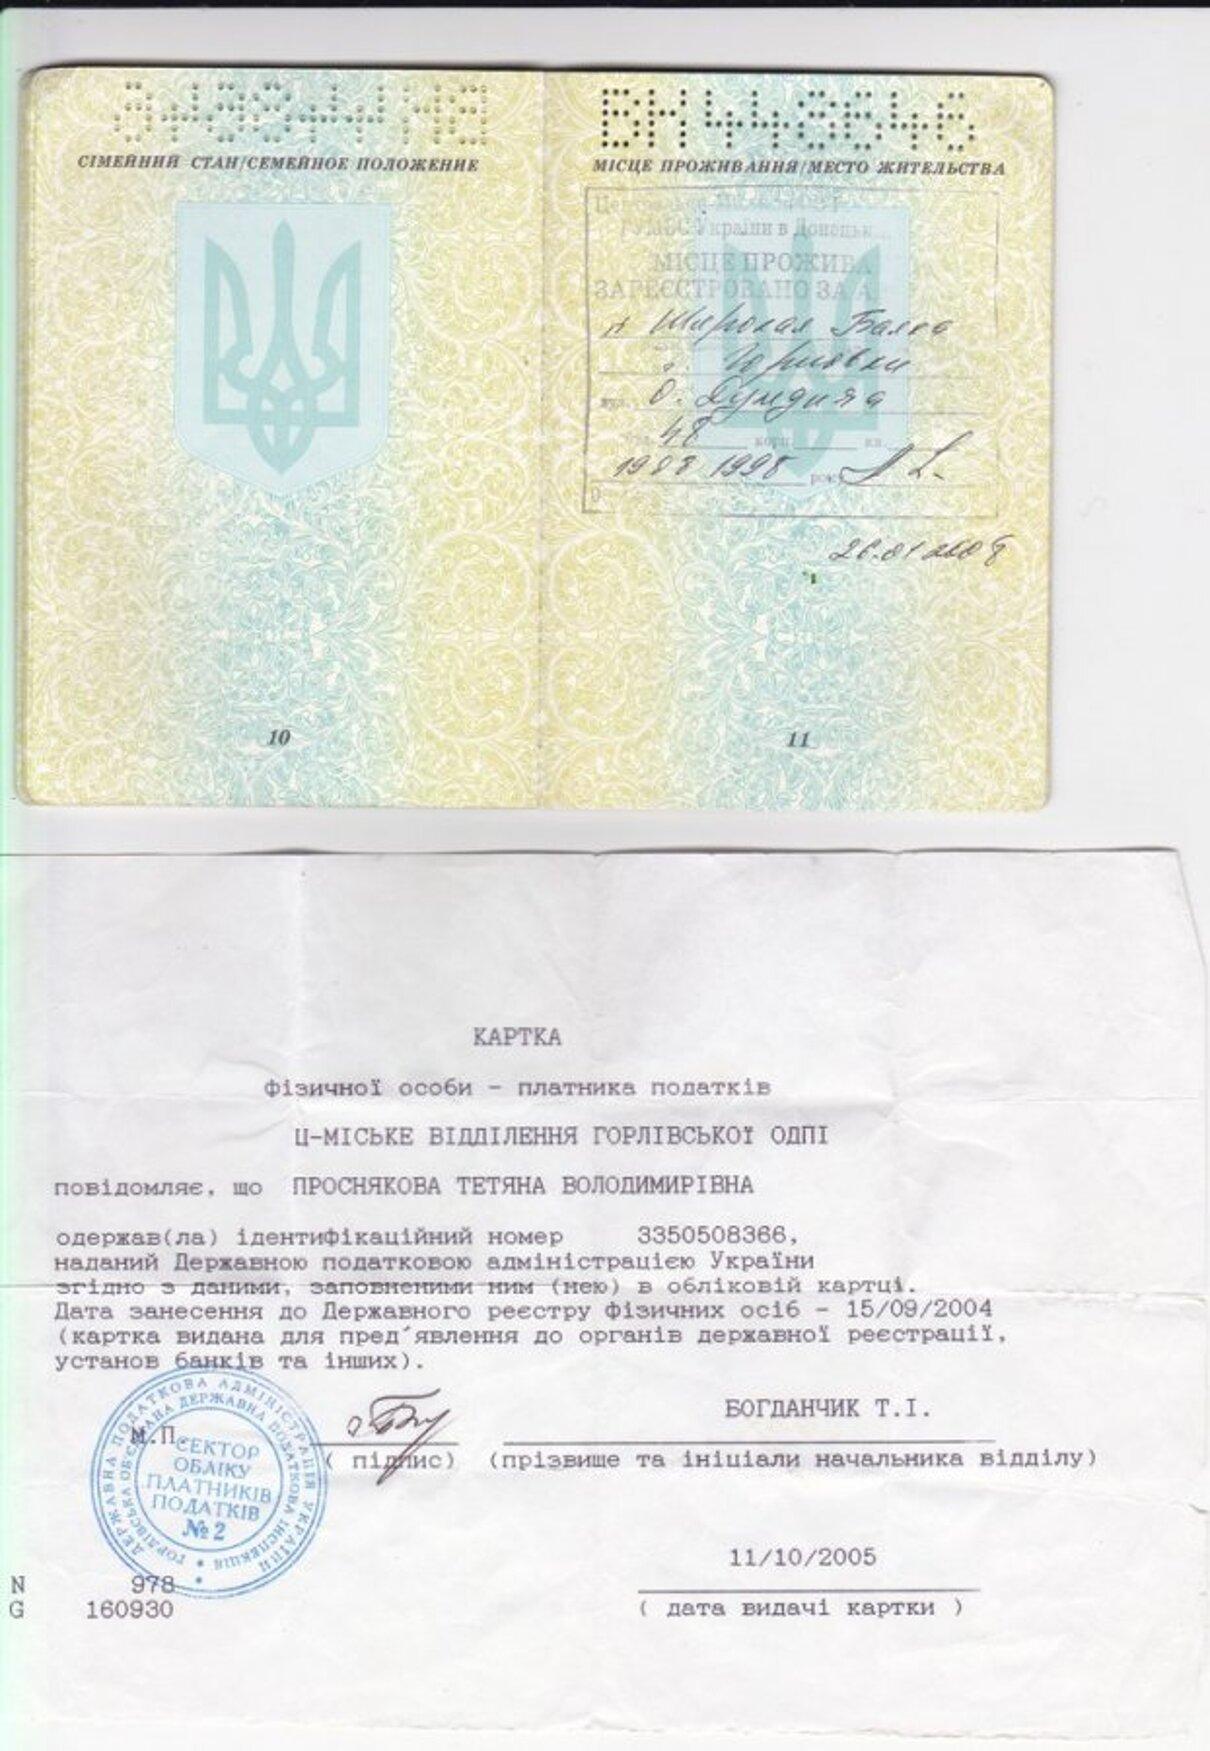 Жалоба-отзыв: 4188373027305108 Татьяна Проснякова - Мошенница.  Фото №2